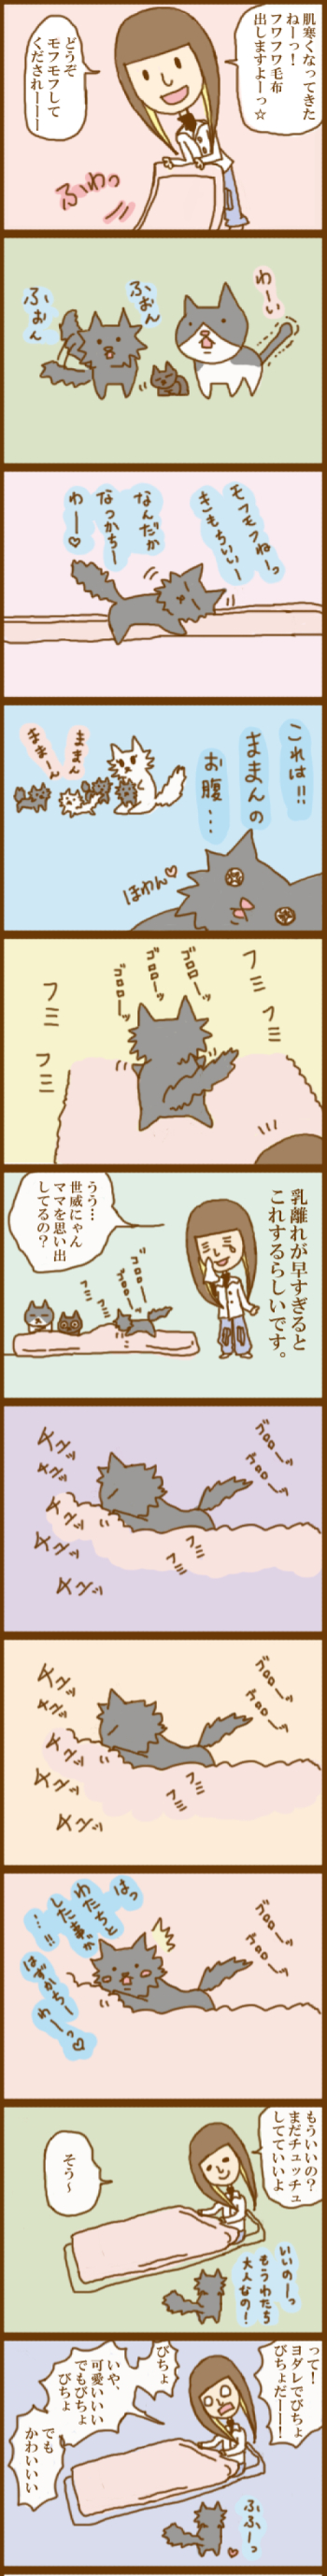 f:id:suzuokayu:20201101161734j:plain